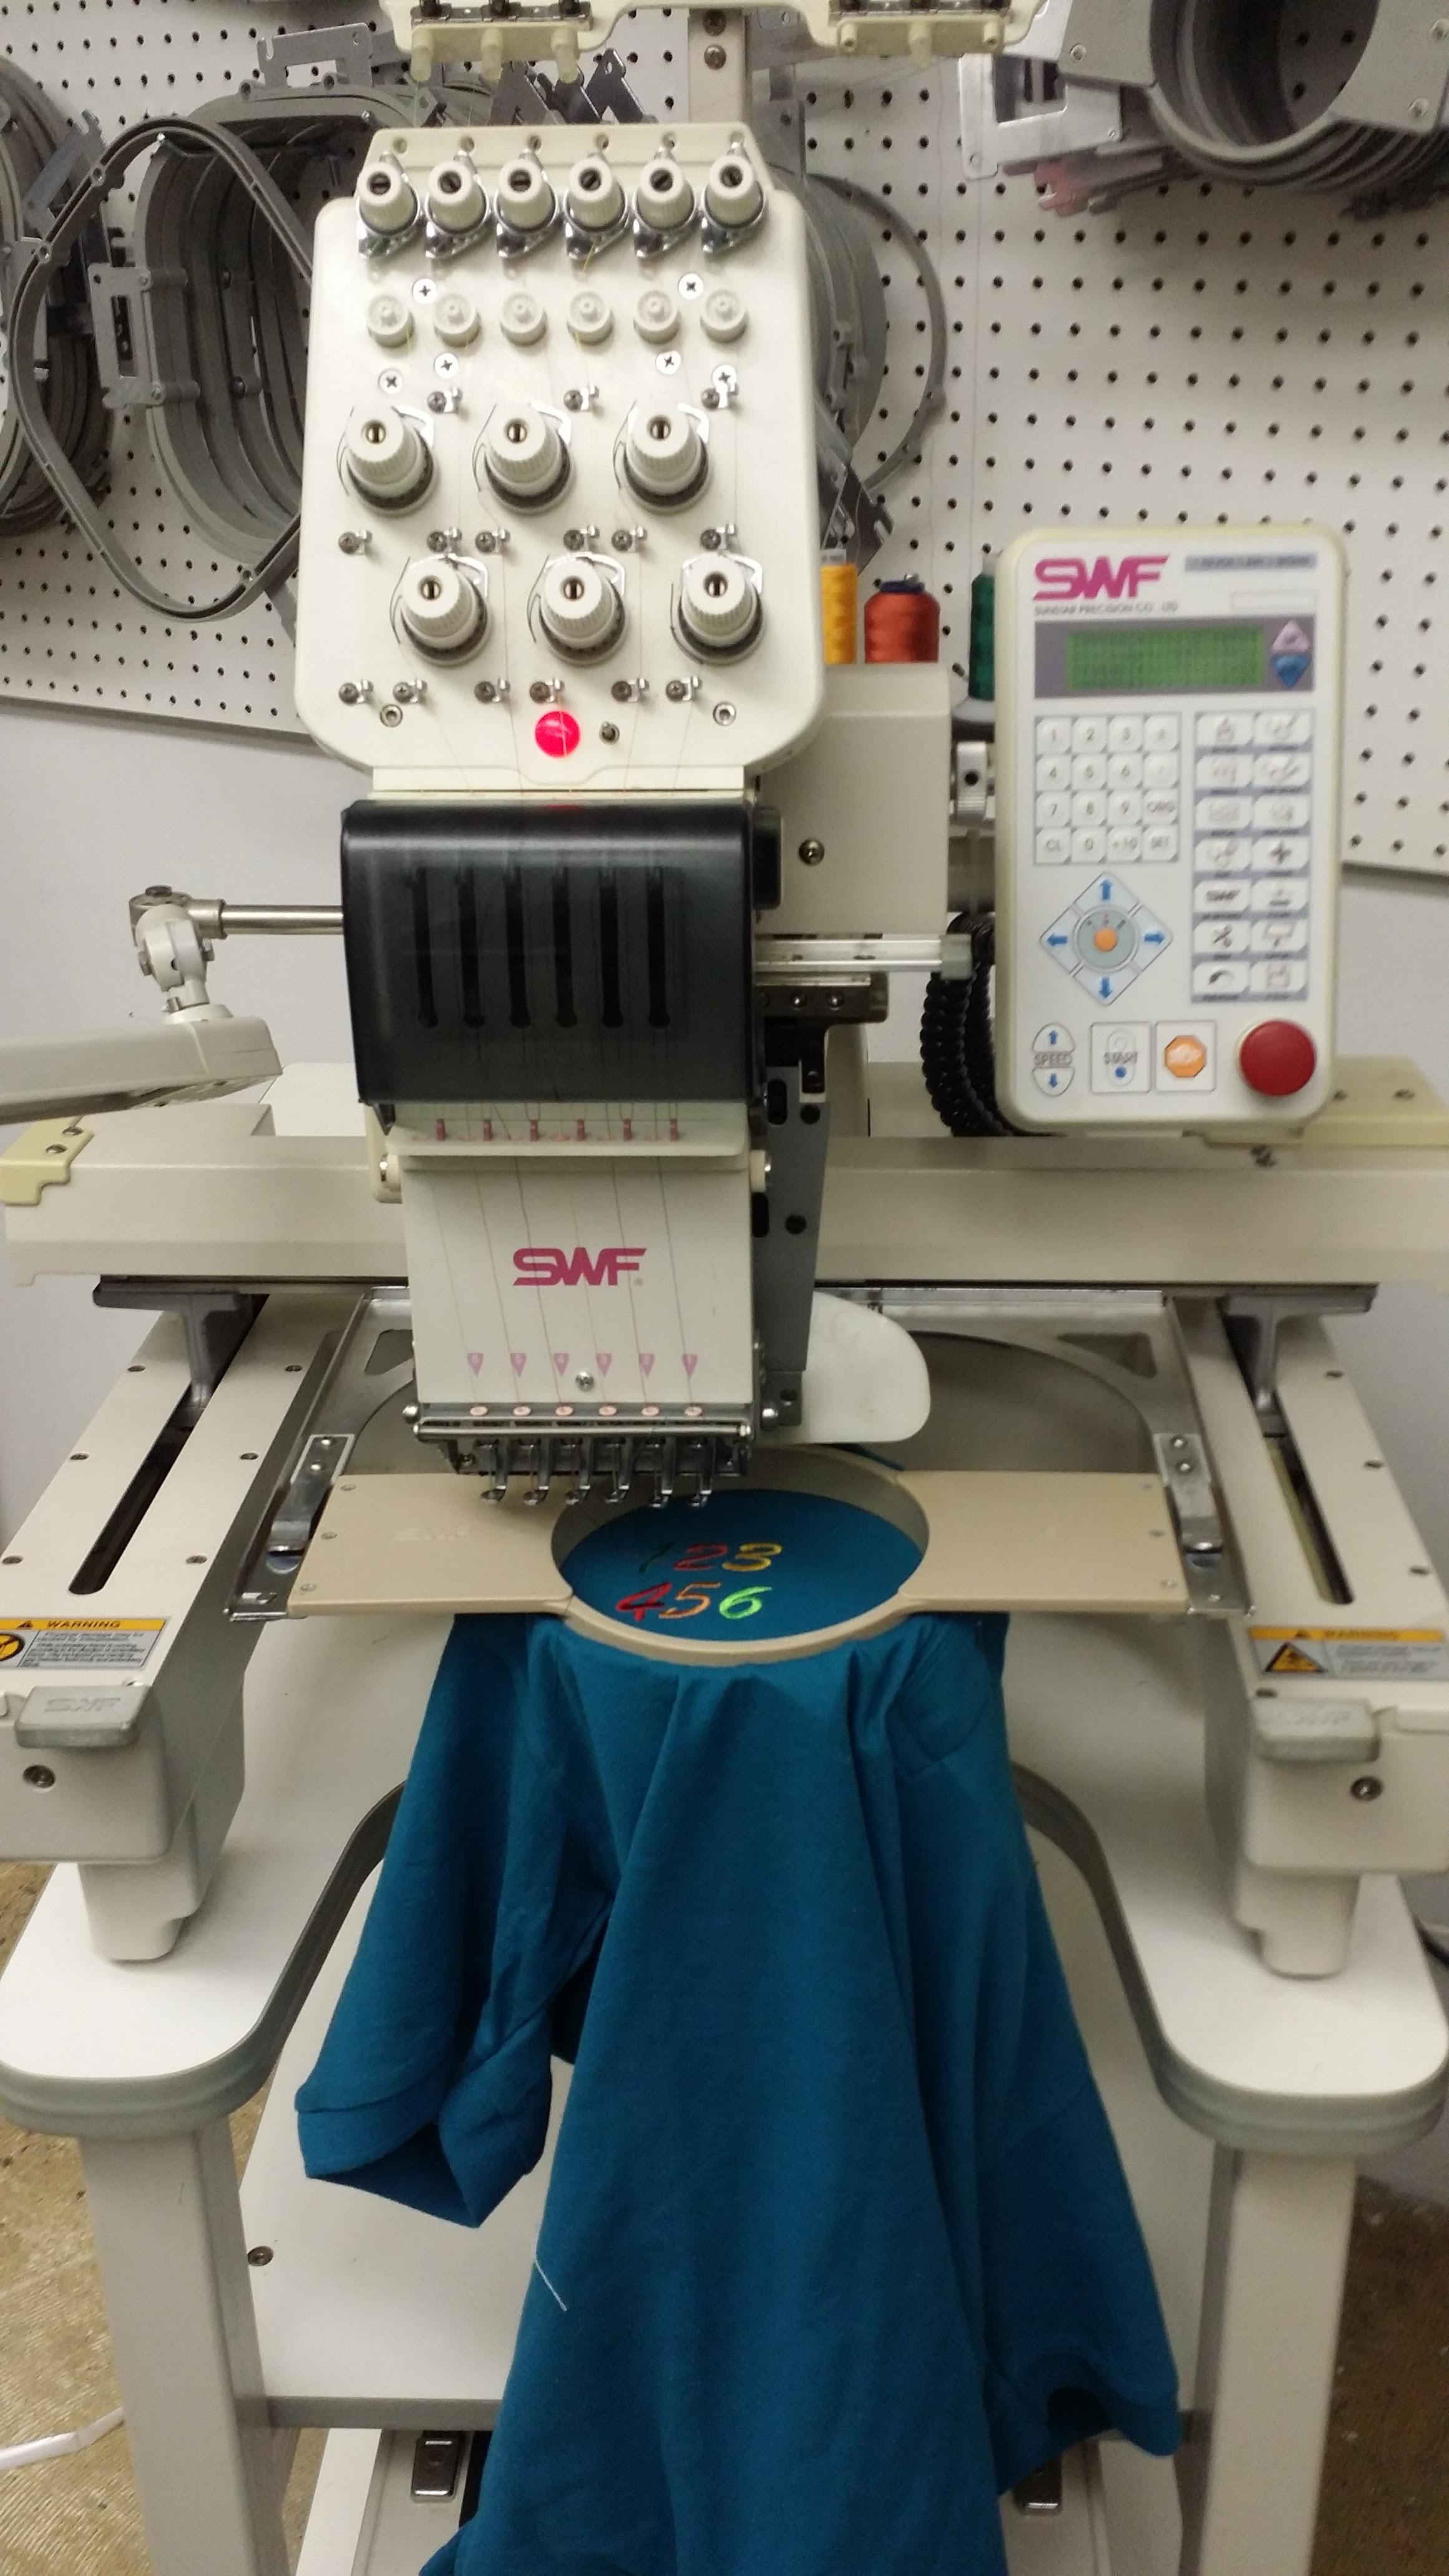 SWF/B-601C single head embroidery machine 6 needles